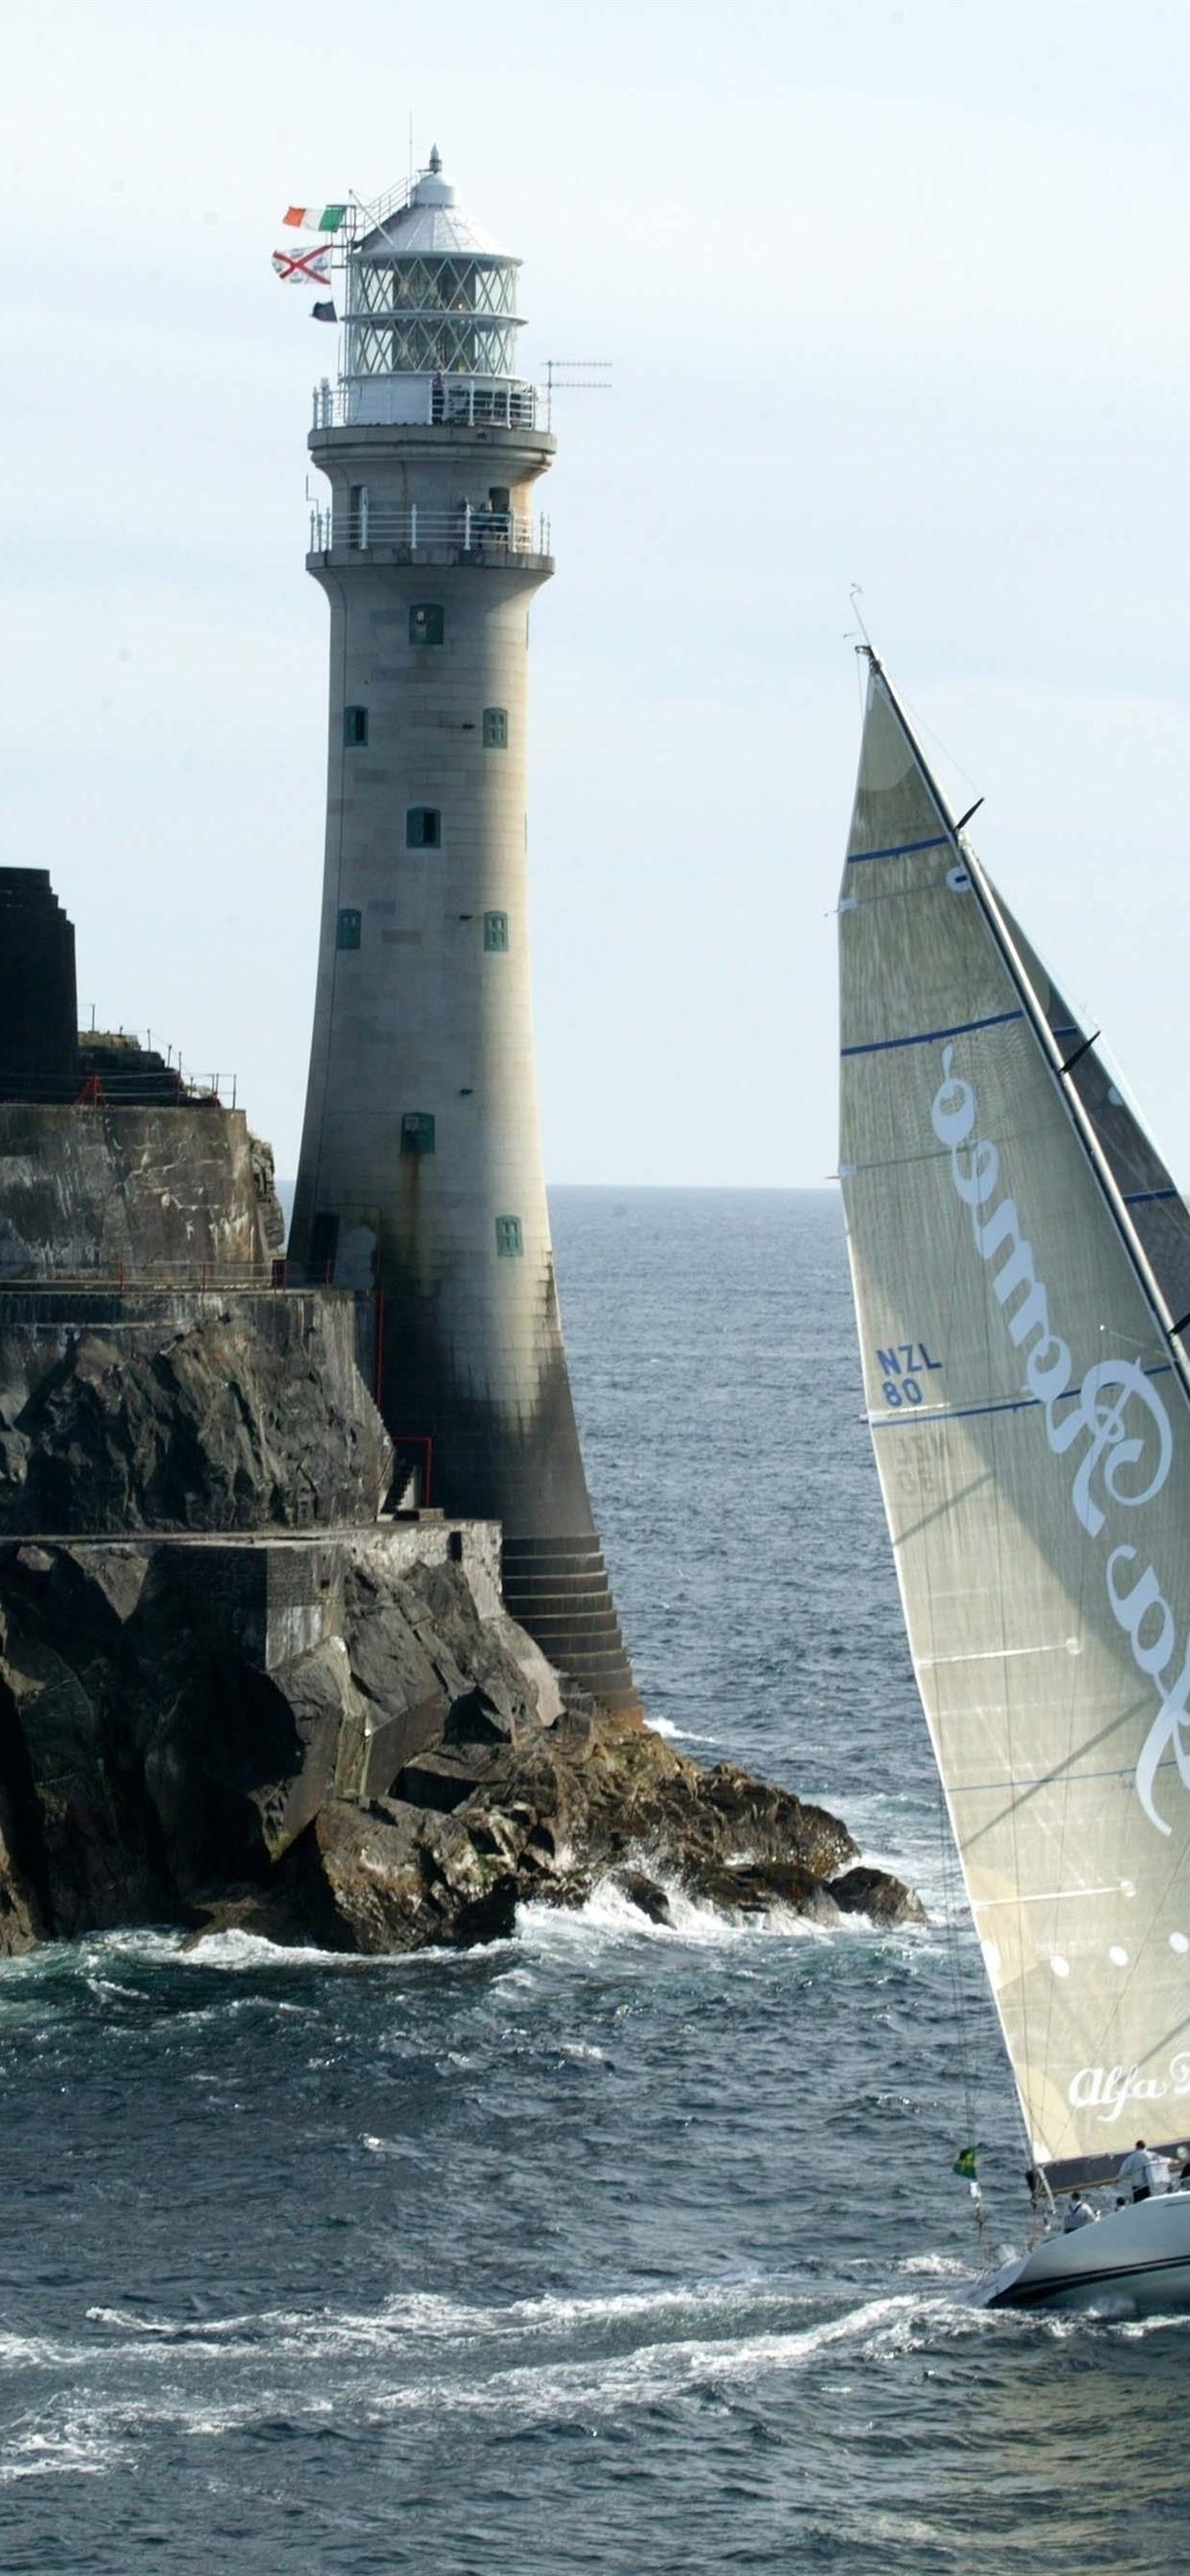 Lighthouse Sailing Sea 1242x2688 Iphone Xs Max Wallpaper